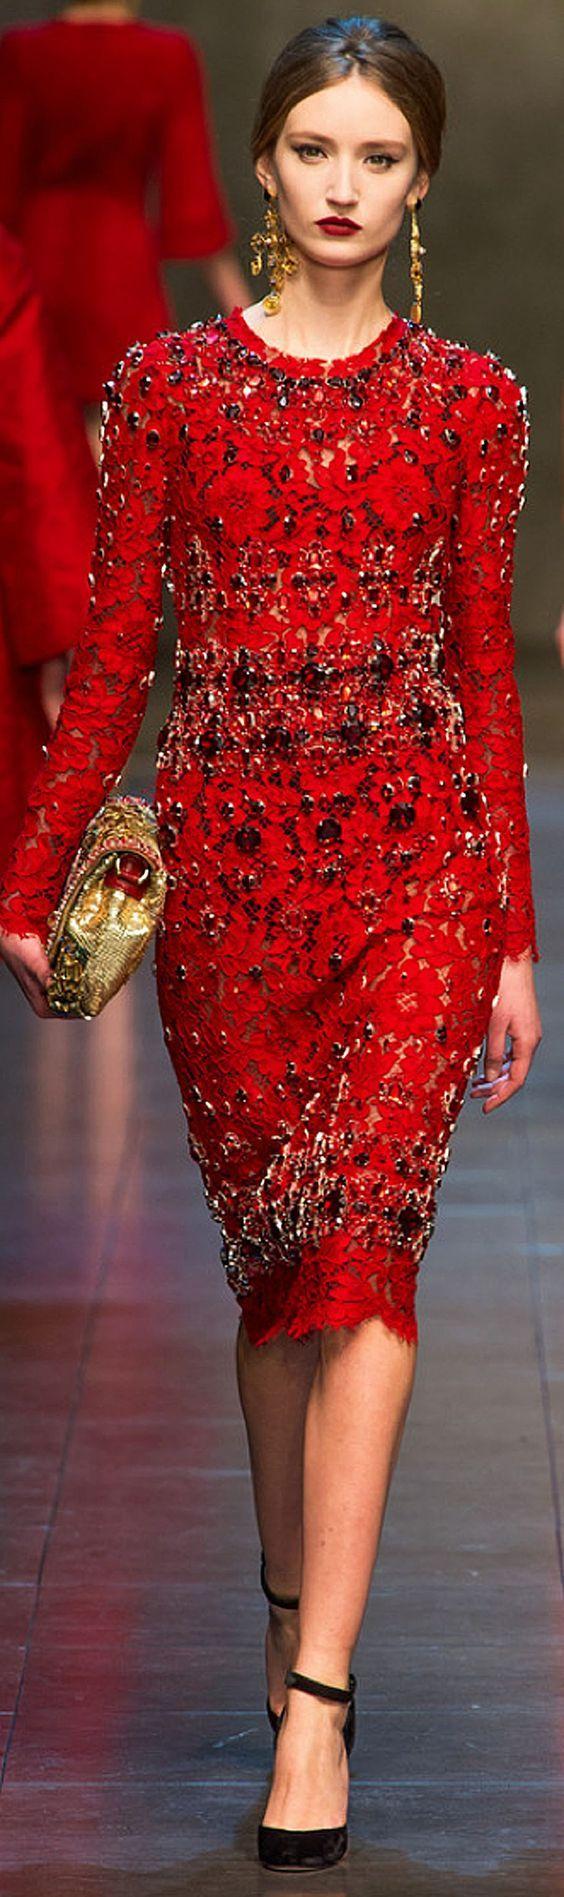 Amazing Runway Fashion!